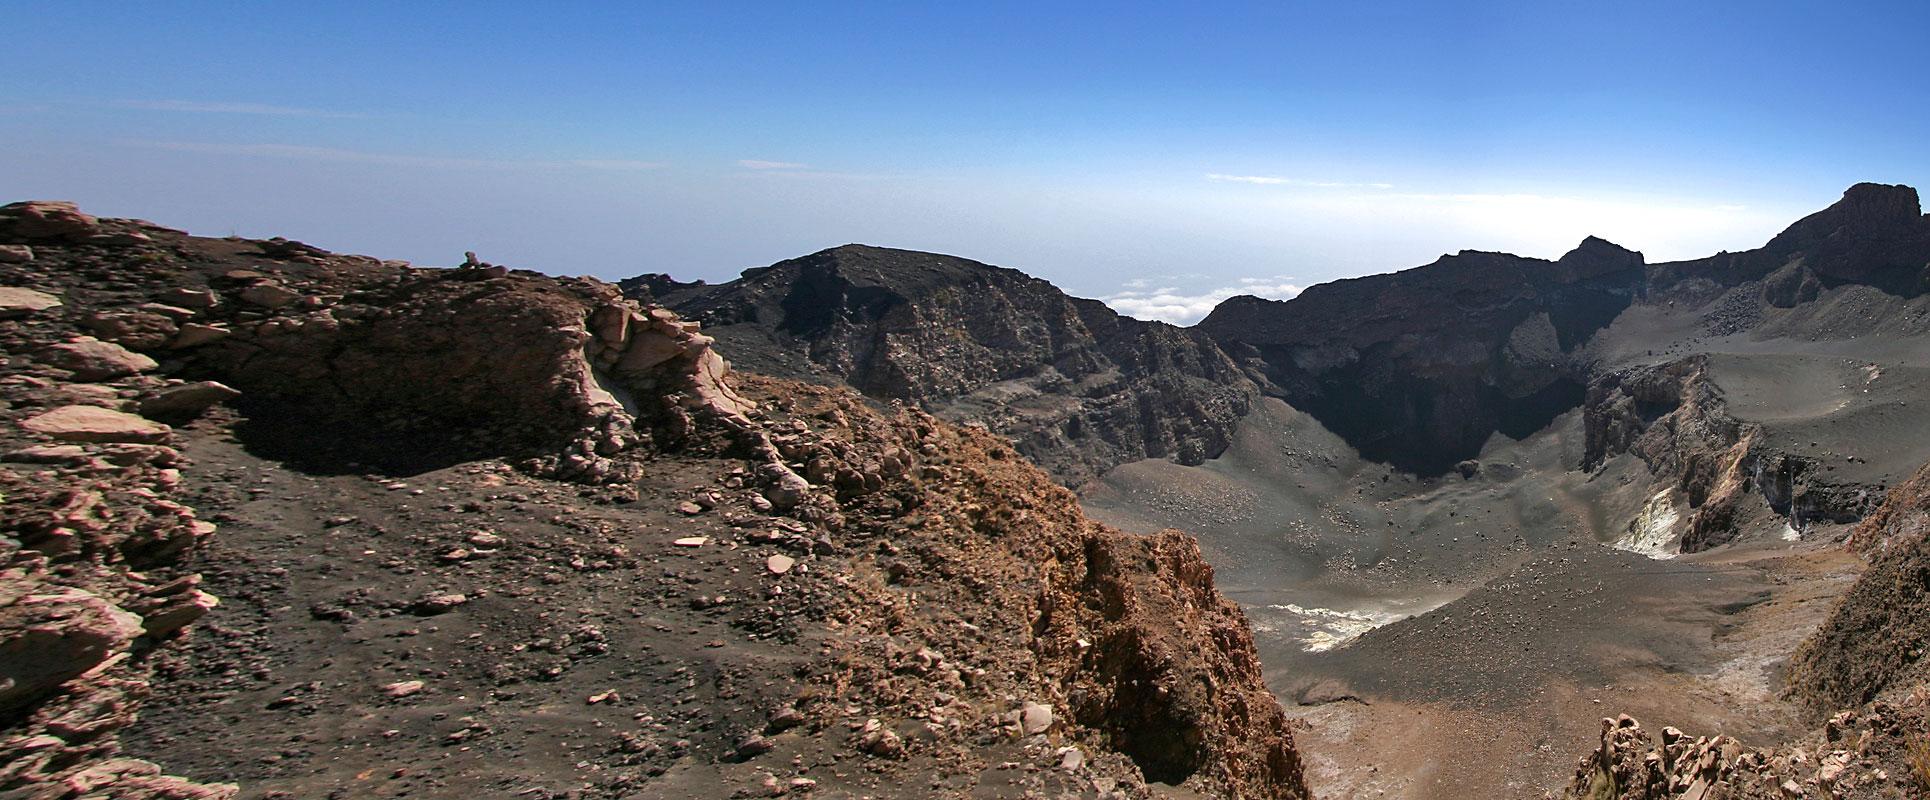 Pico de Fogo Crater